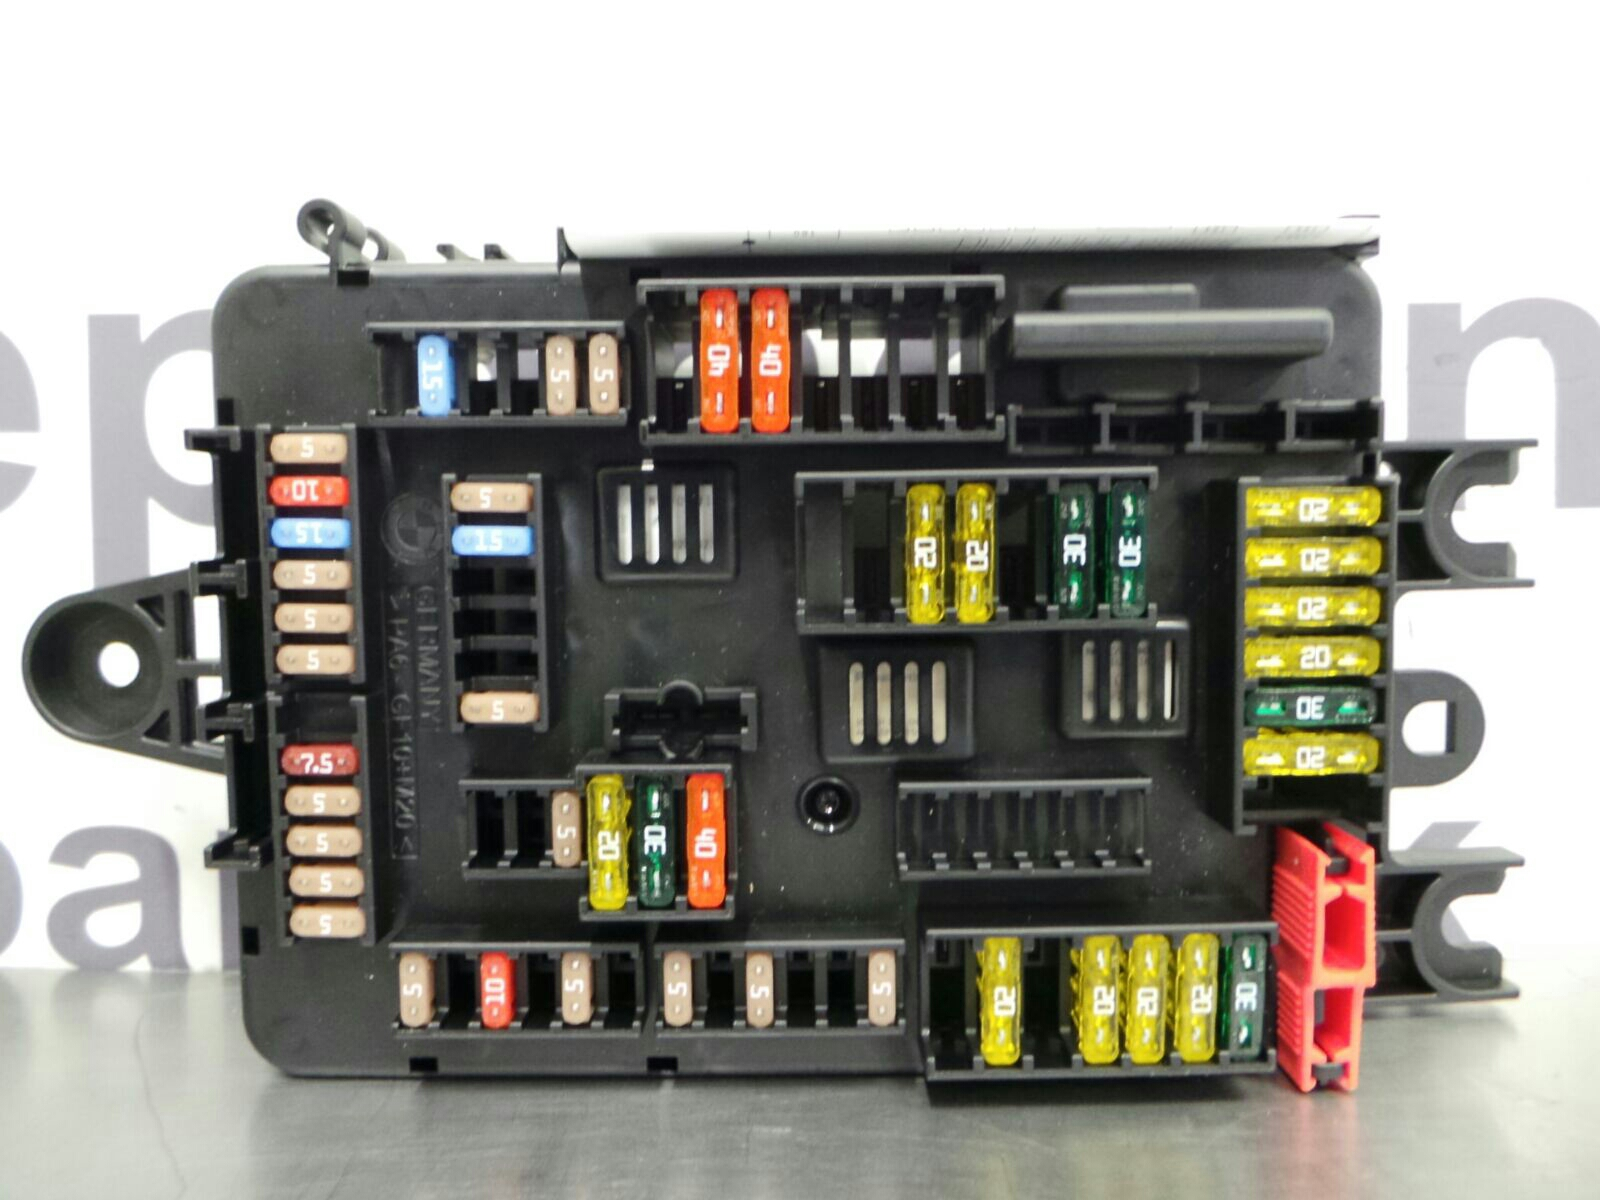 hight resolution of f20 fuse box schema diagram databasebmw f20 fuse box wiring library bmw f20 boot fuse box